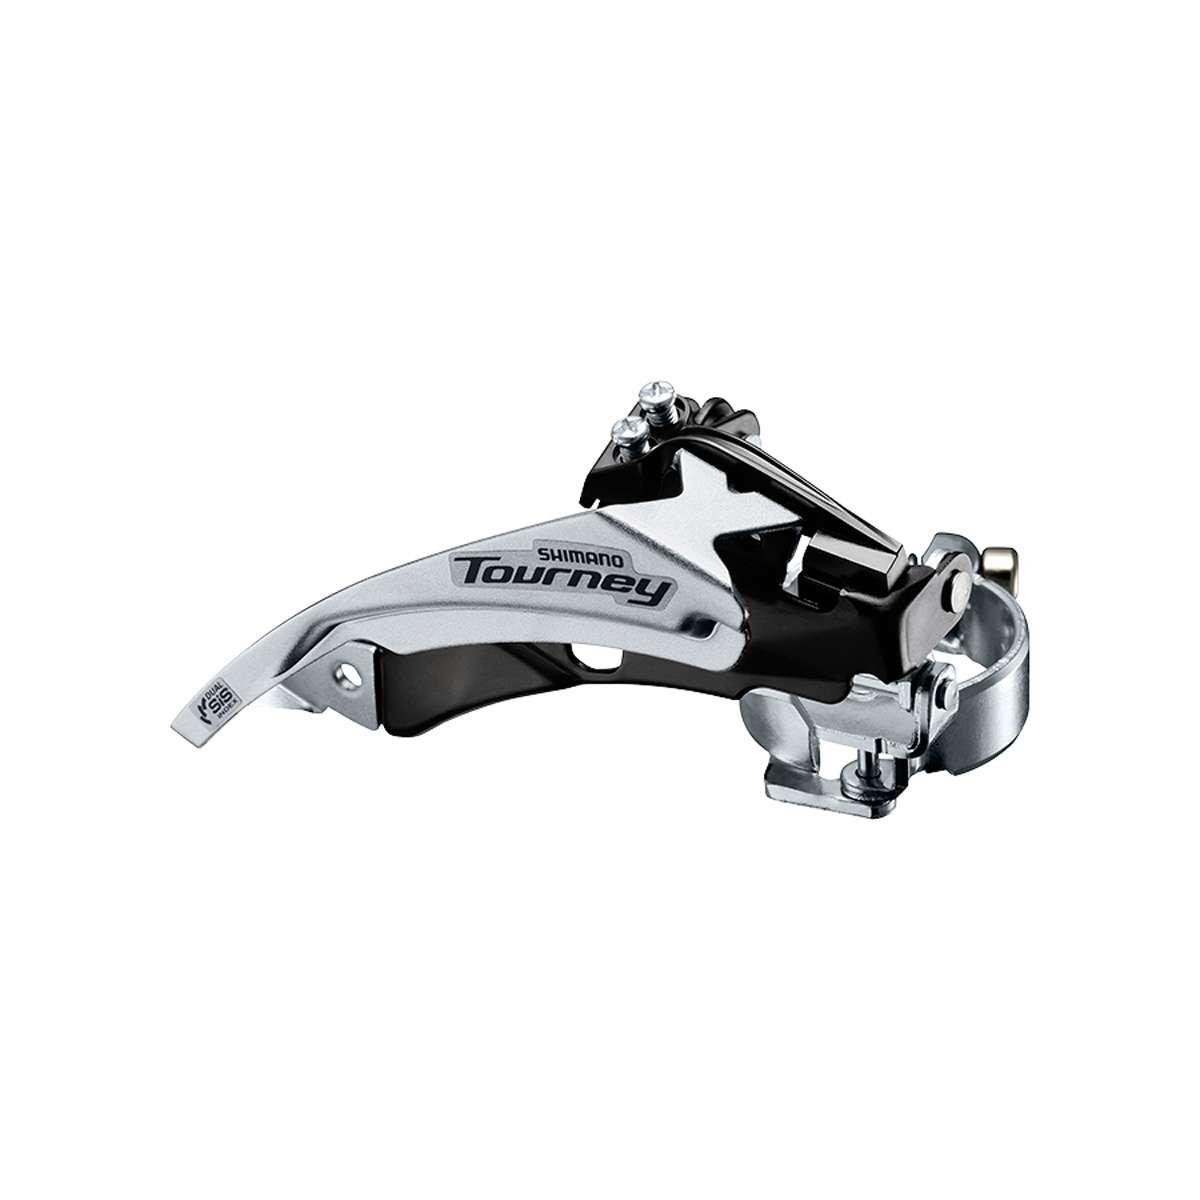 Shimano Tourneyマウンテン自転車フロントDerailleur – fd-ty500-ts3 – efdty500tsx3 B073WQWL9F